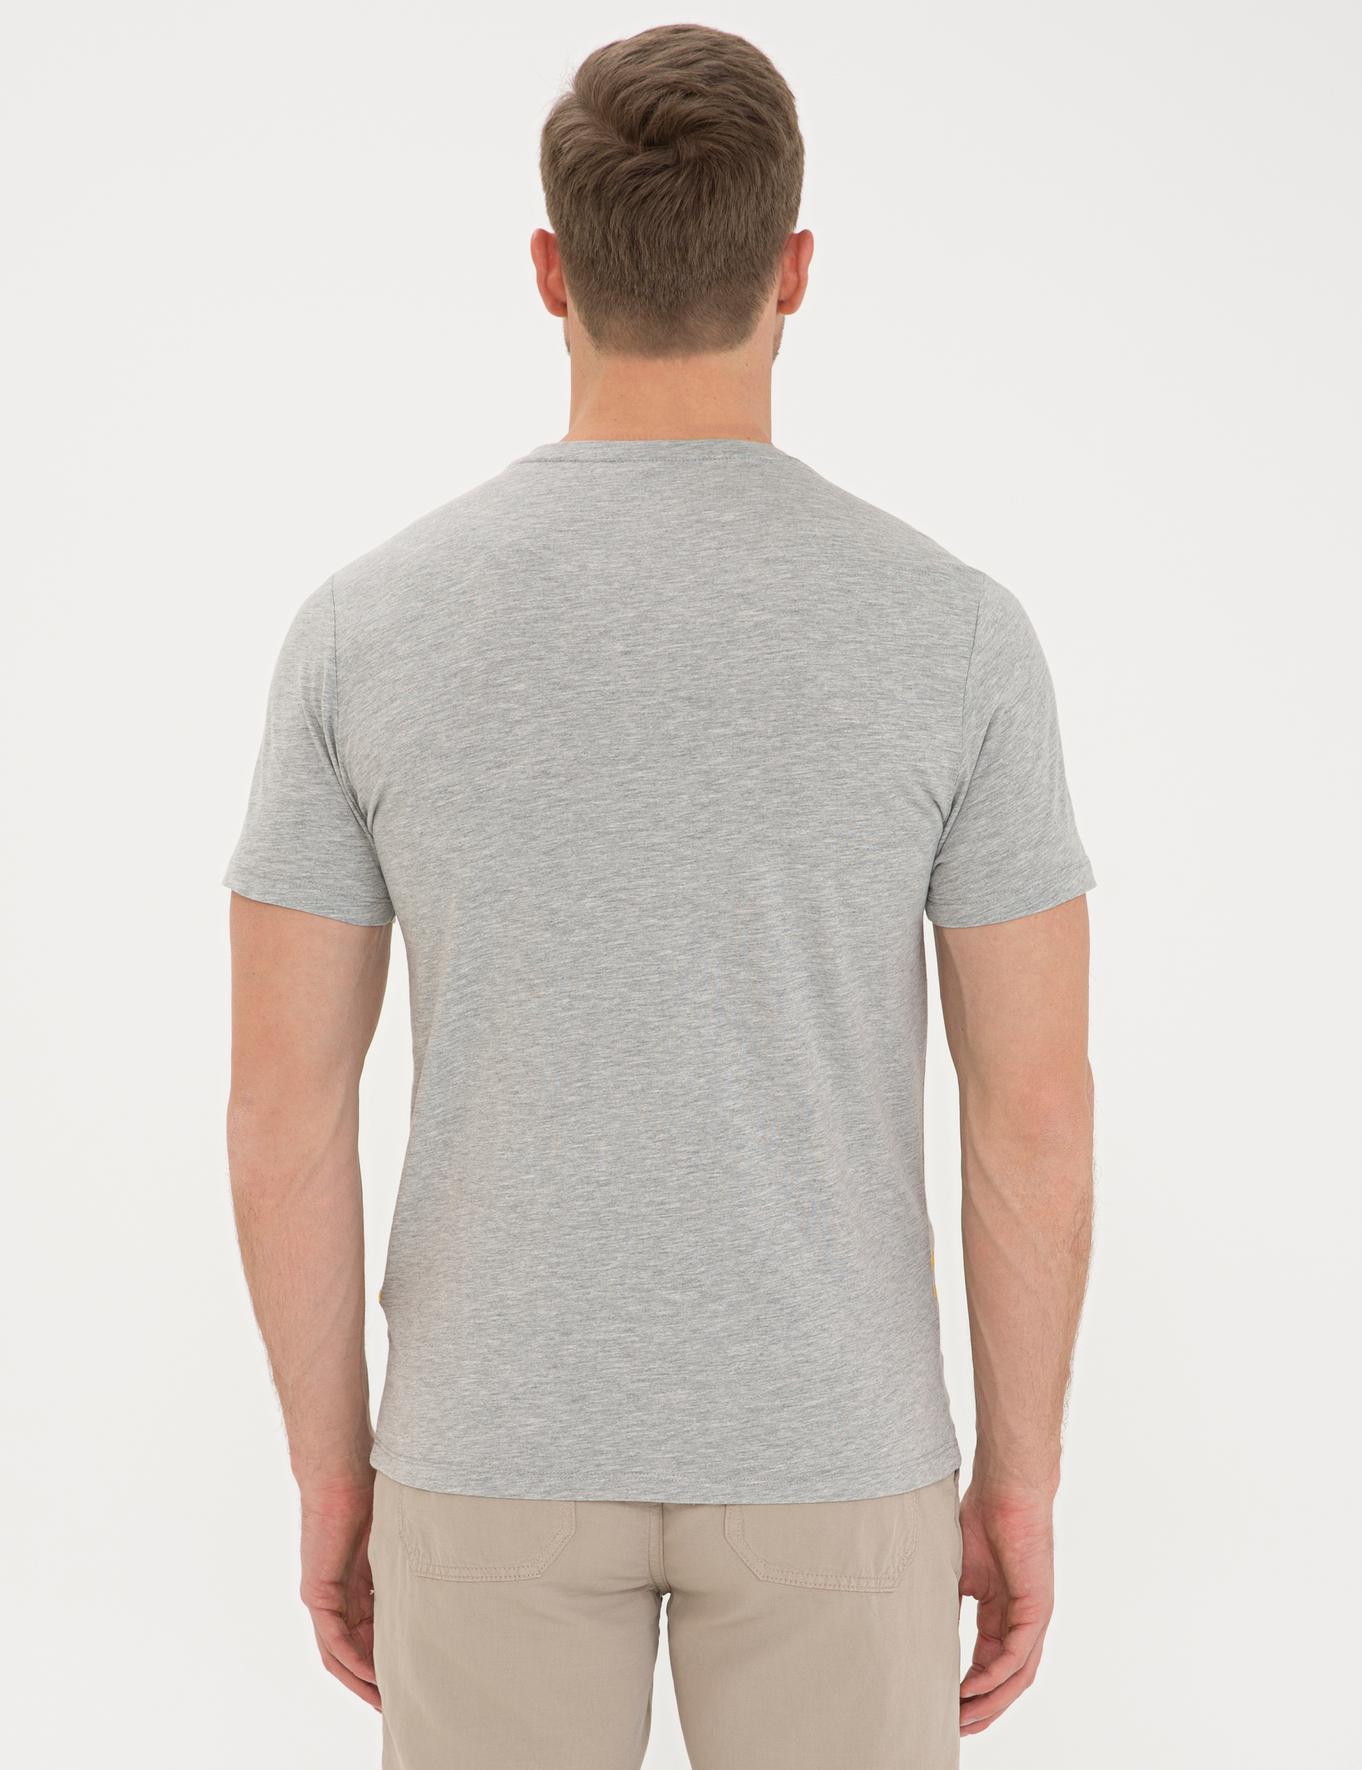 Açık Gri Melanj Slim Fit Bisiklet Yaka T-Shirt